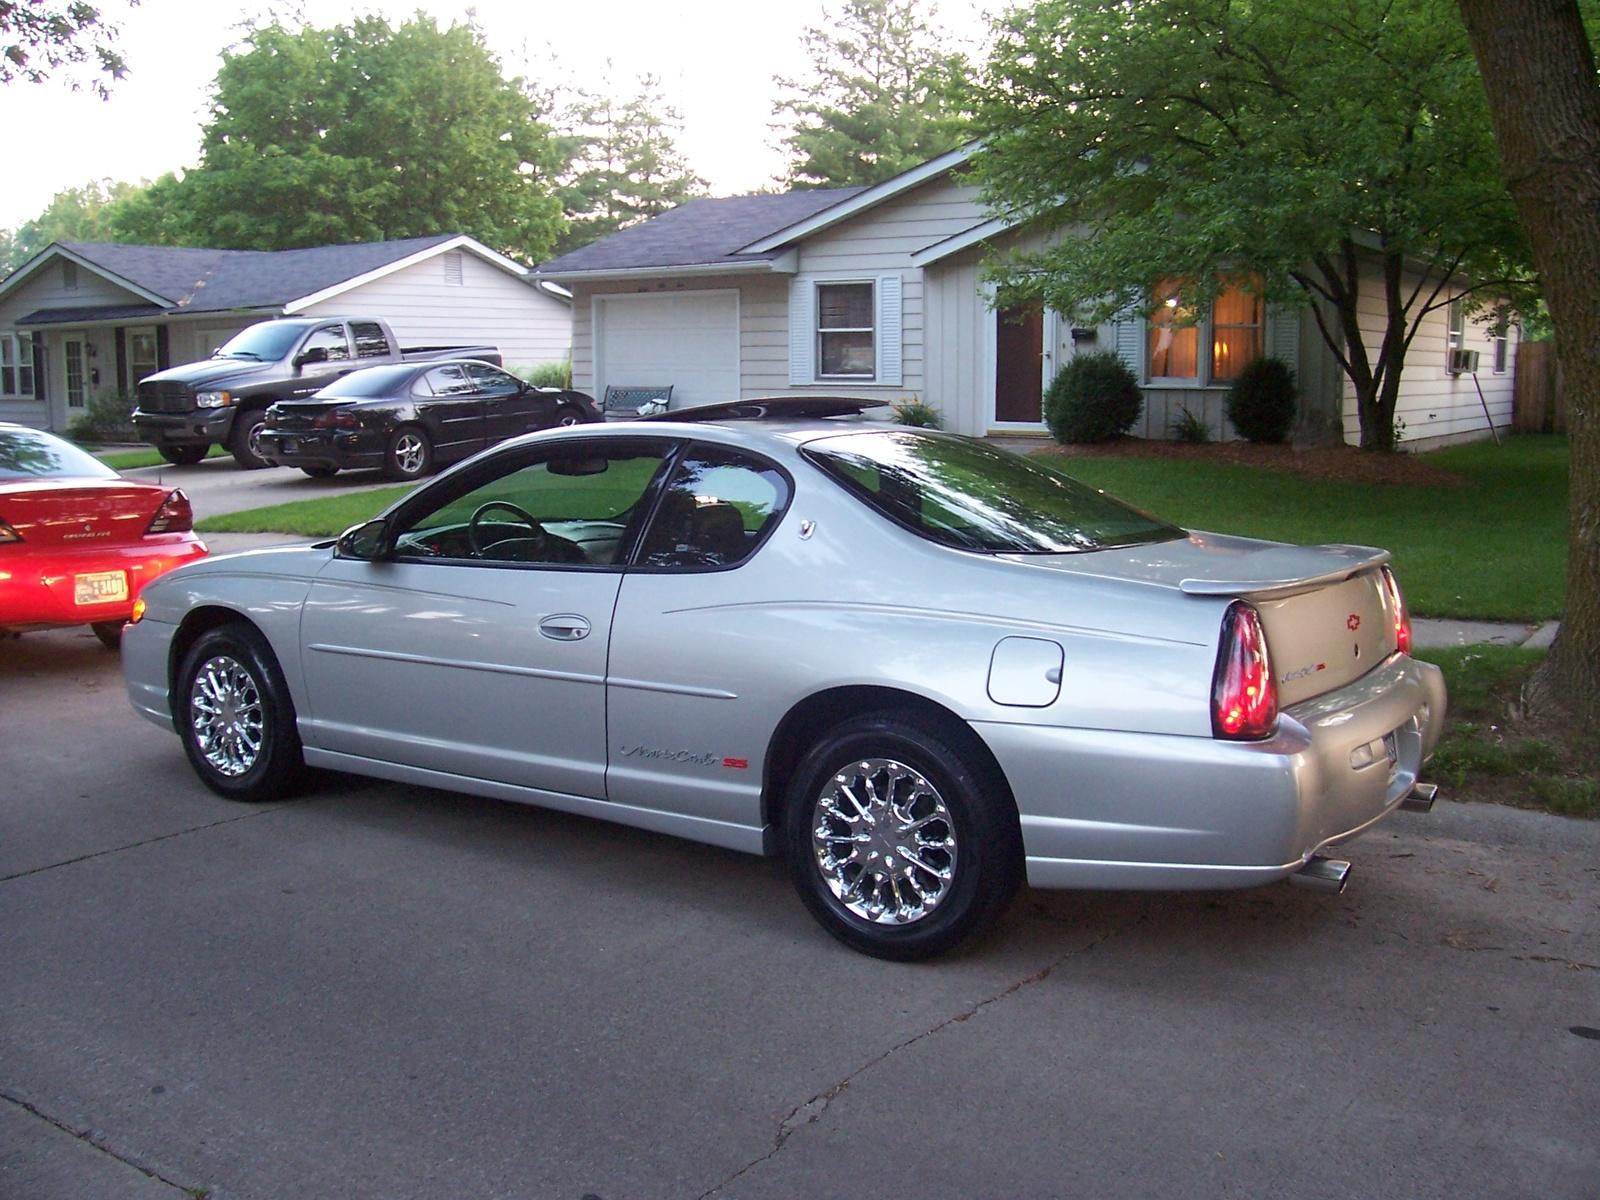 1988 Monte Carlo Ss Specs >> 2000 Chevrolet Monte Carlo - Exterior Pictures - CarGurus